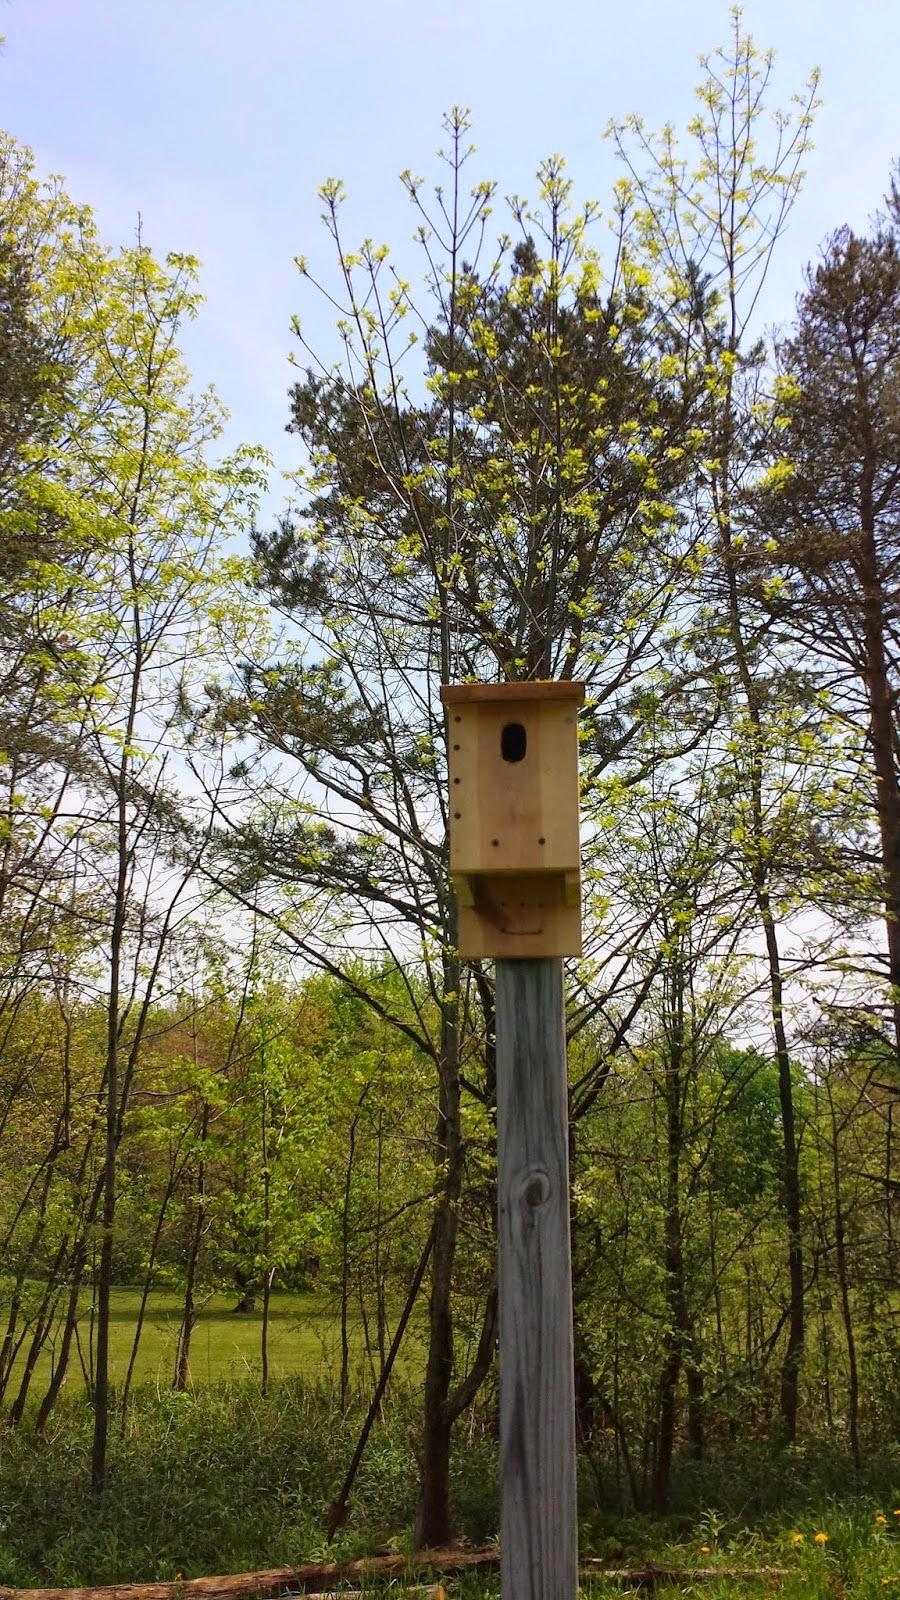 Eastern Bluebird House, shared by Halfway Oak Farm